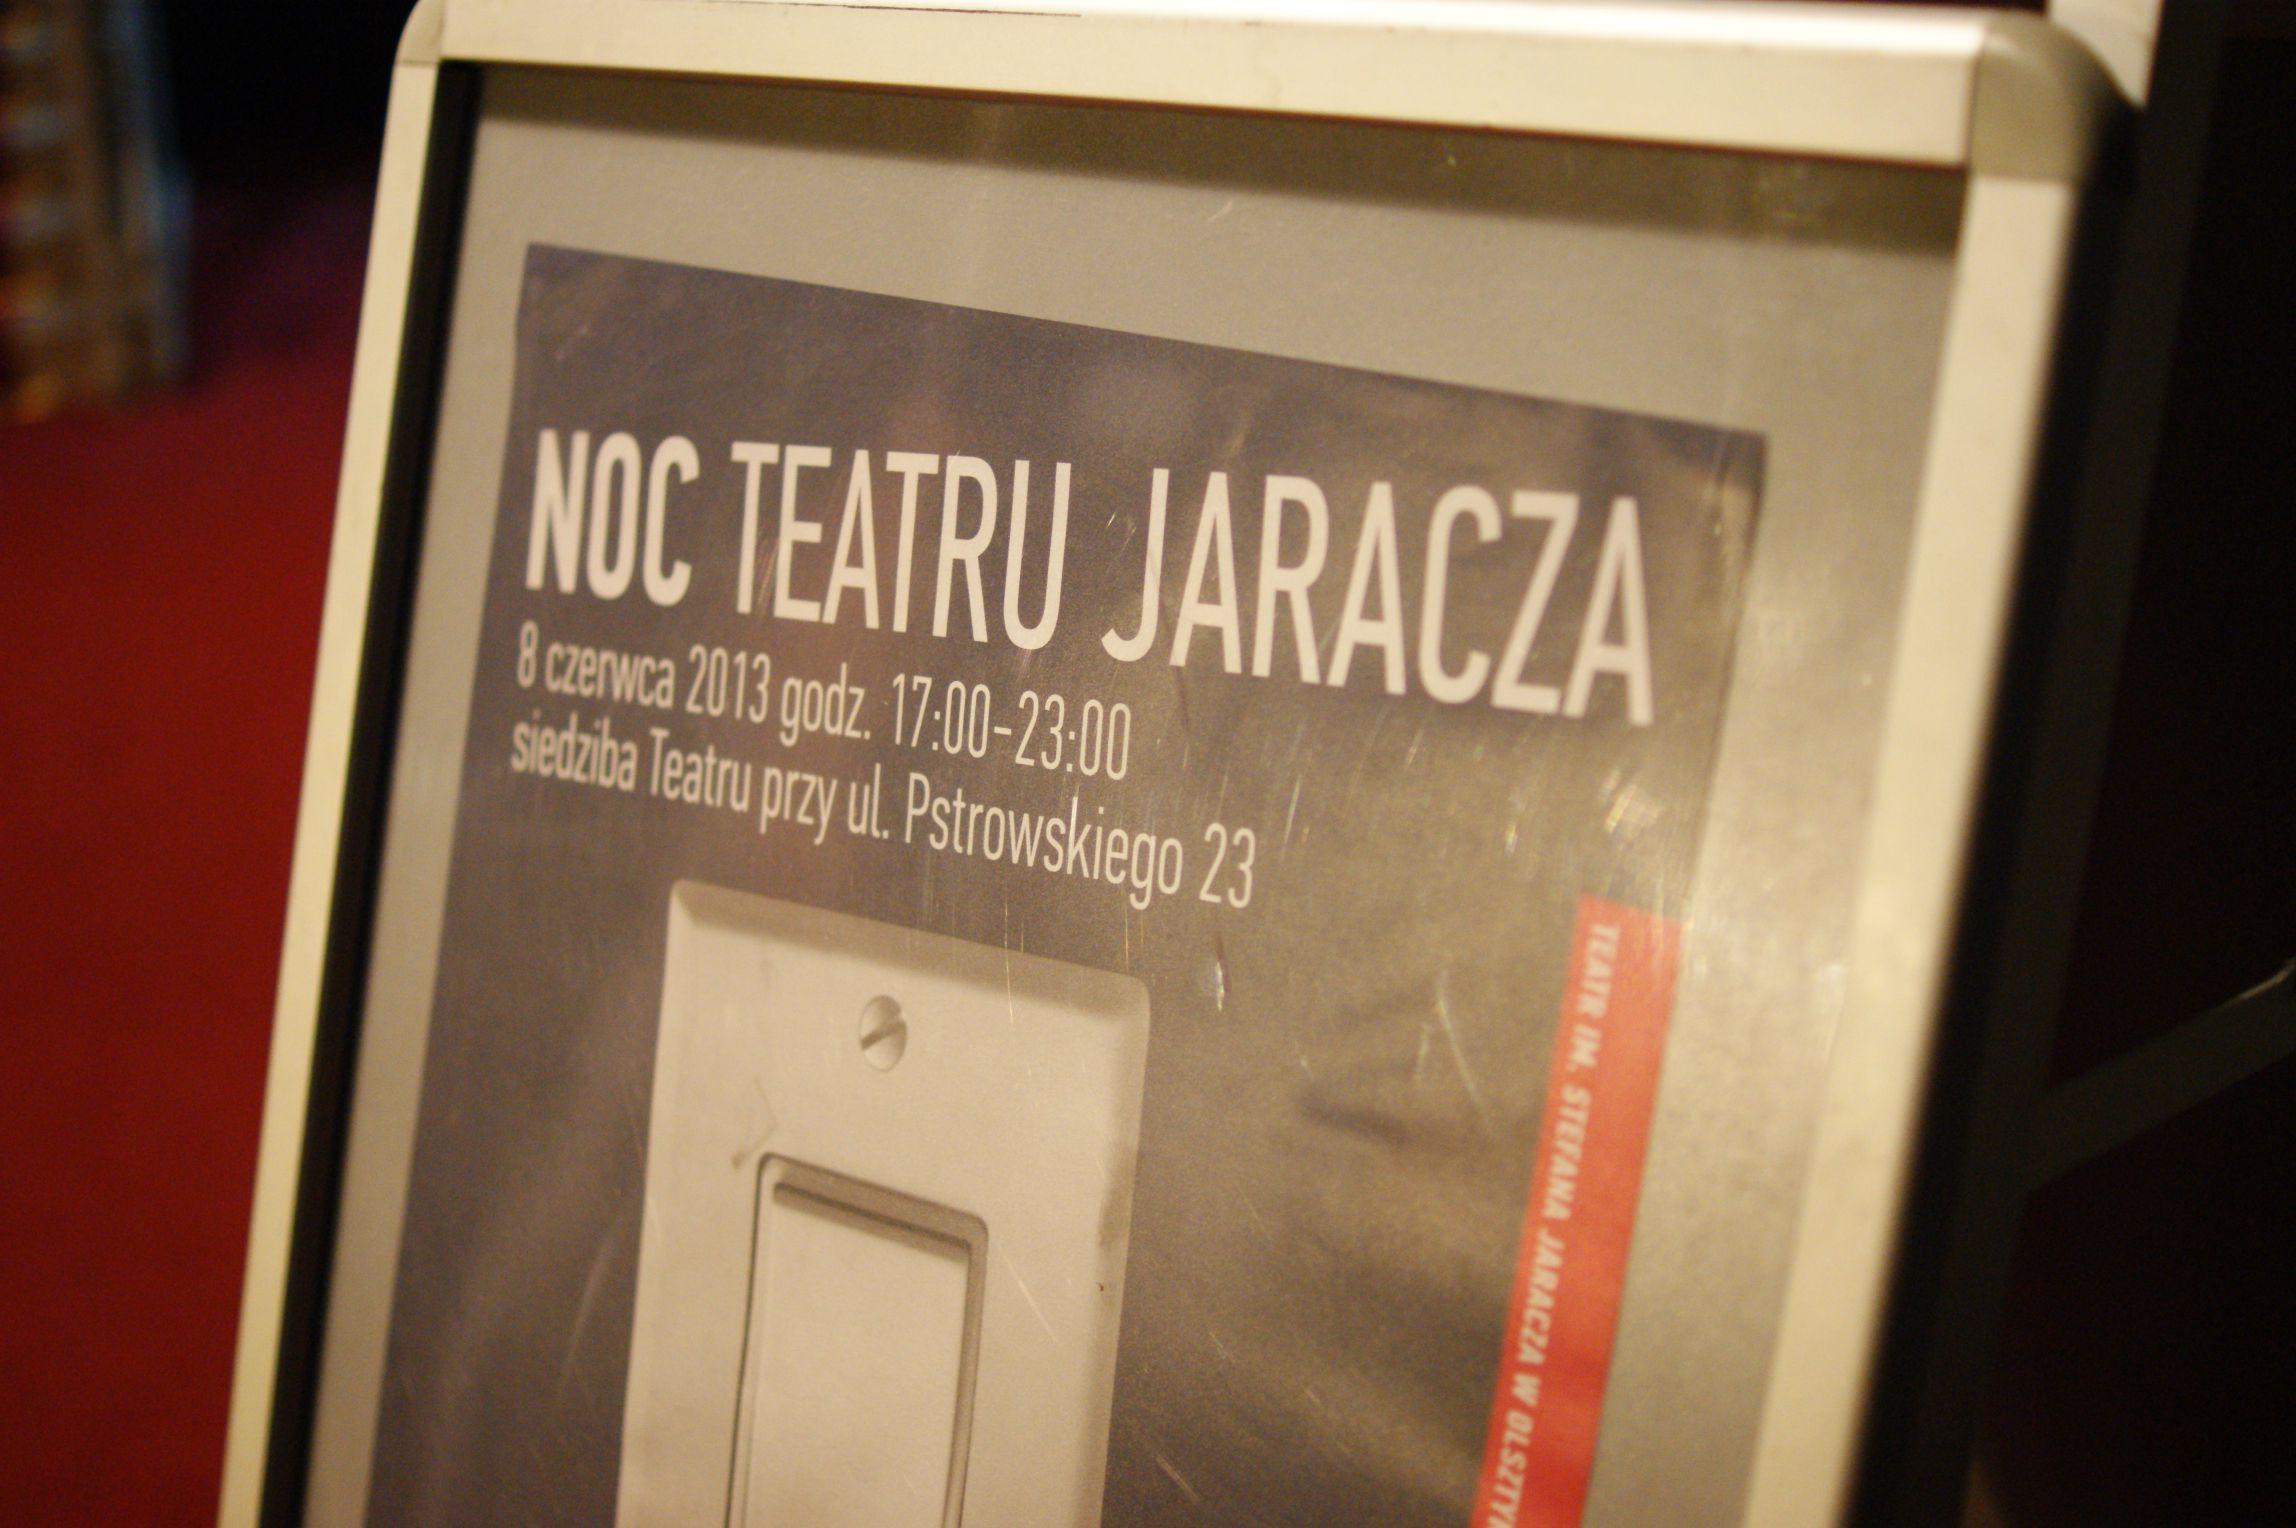 Noc Teatru Jaracza